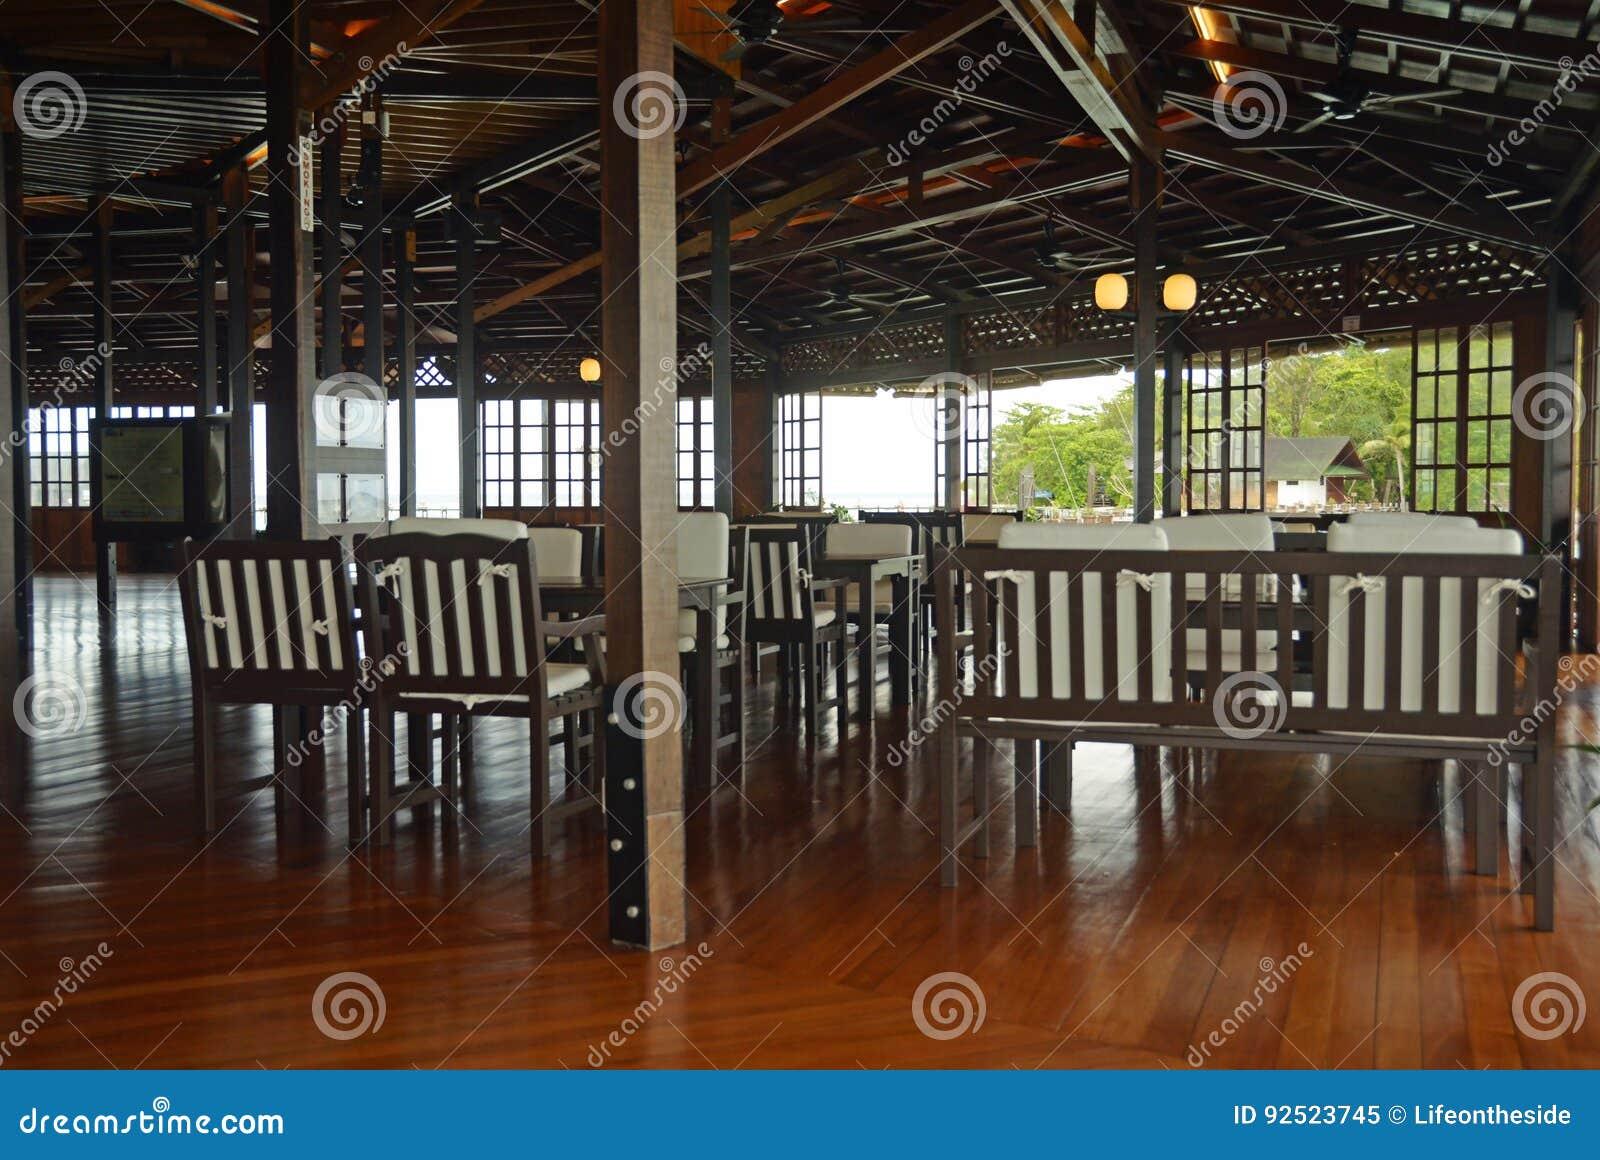 interior decor of luxury tropical island resort restaurant stock